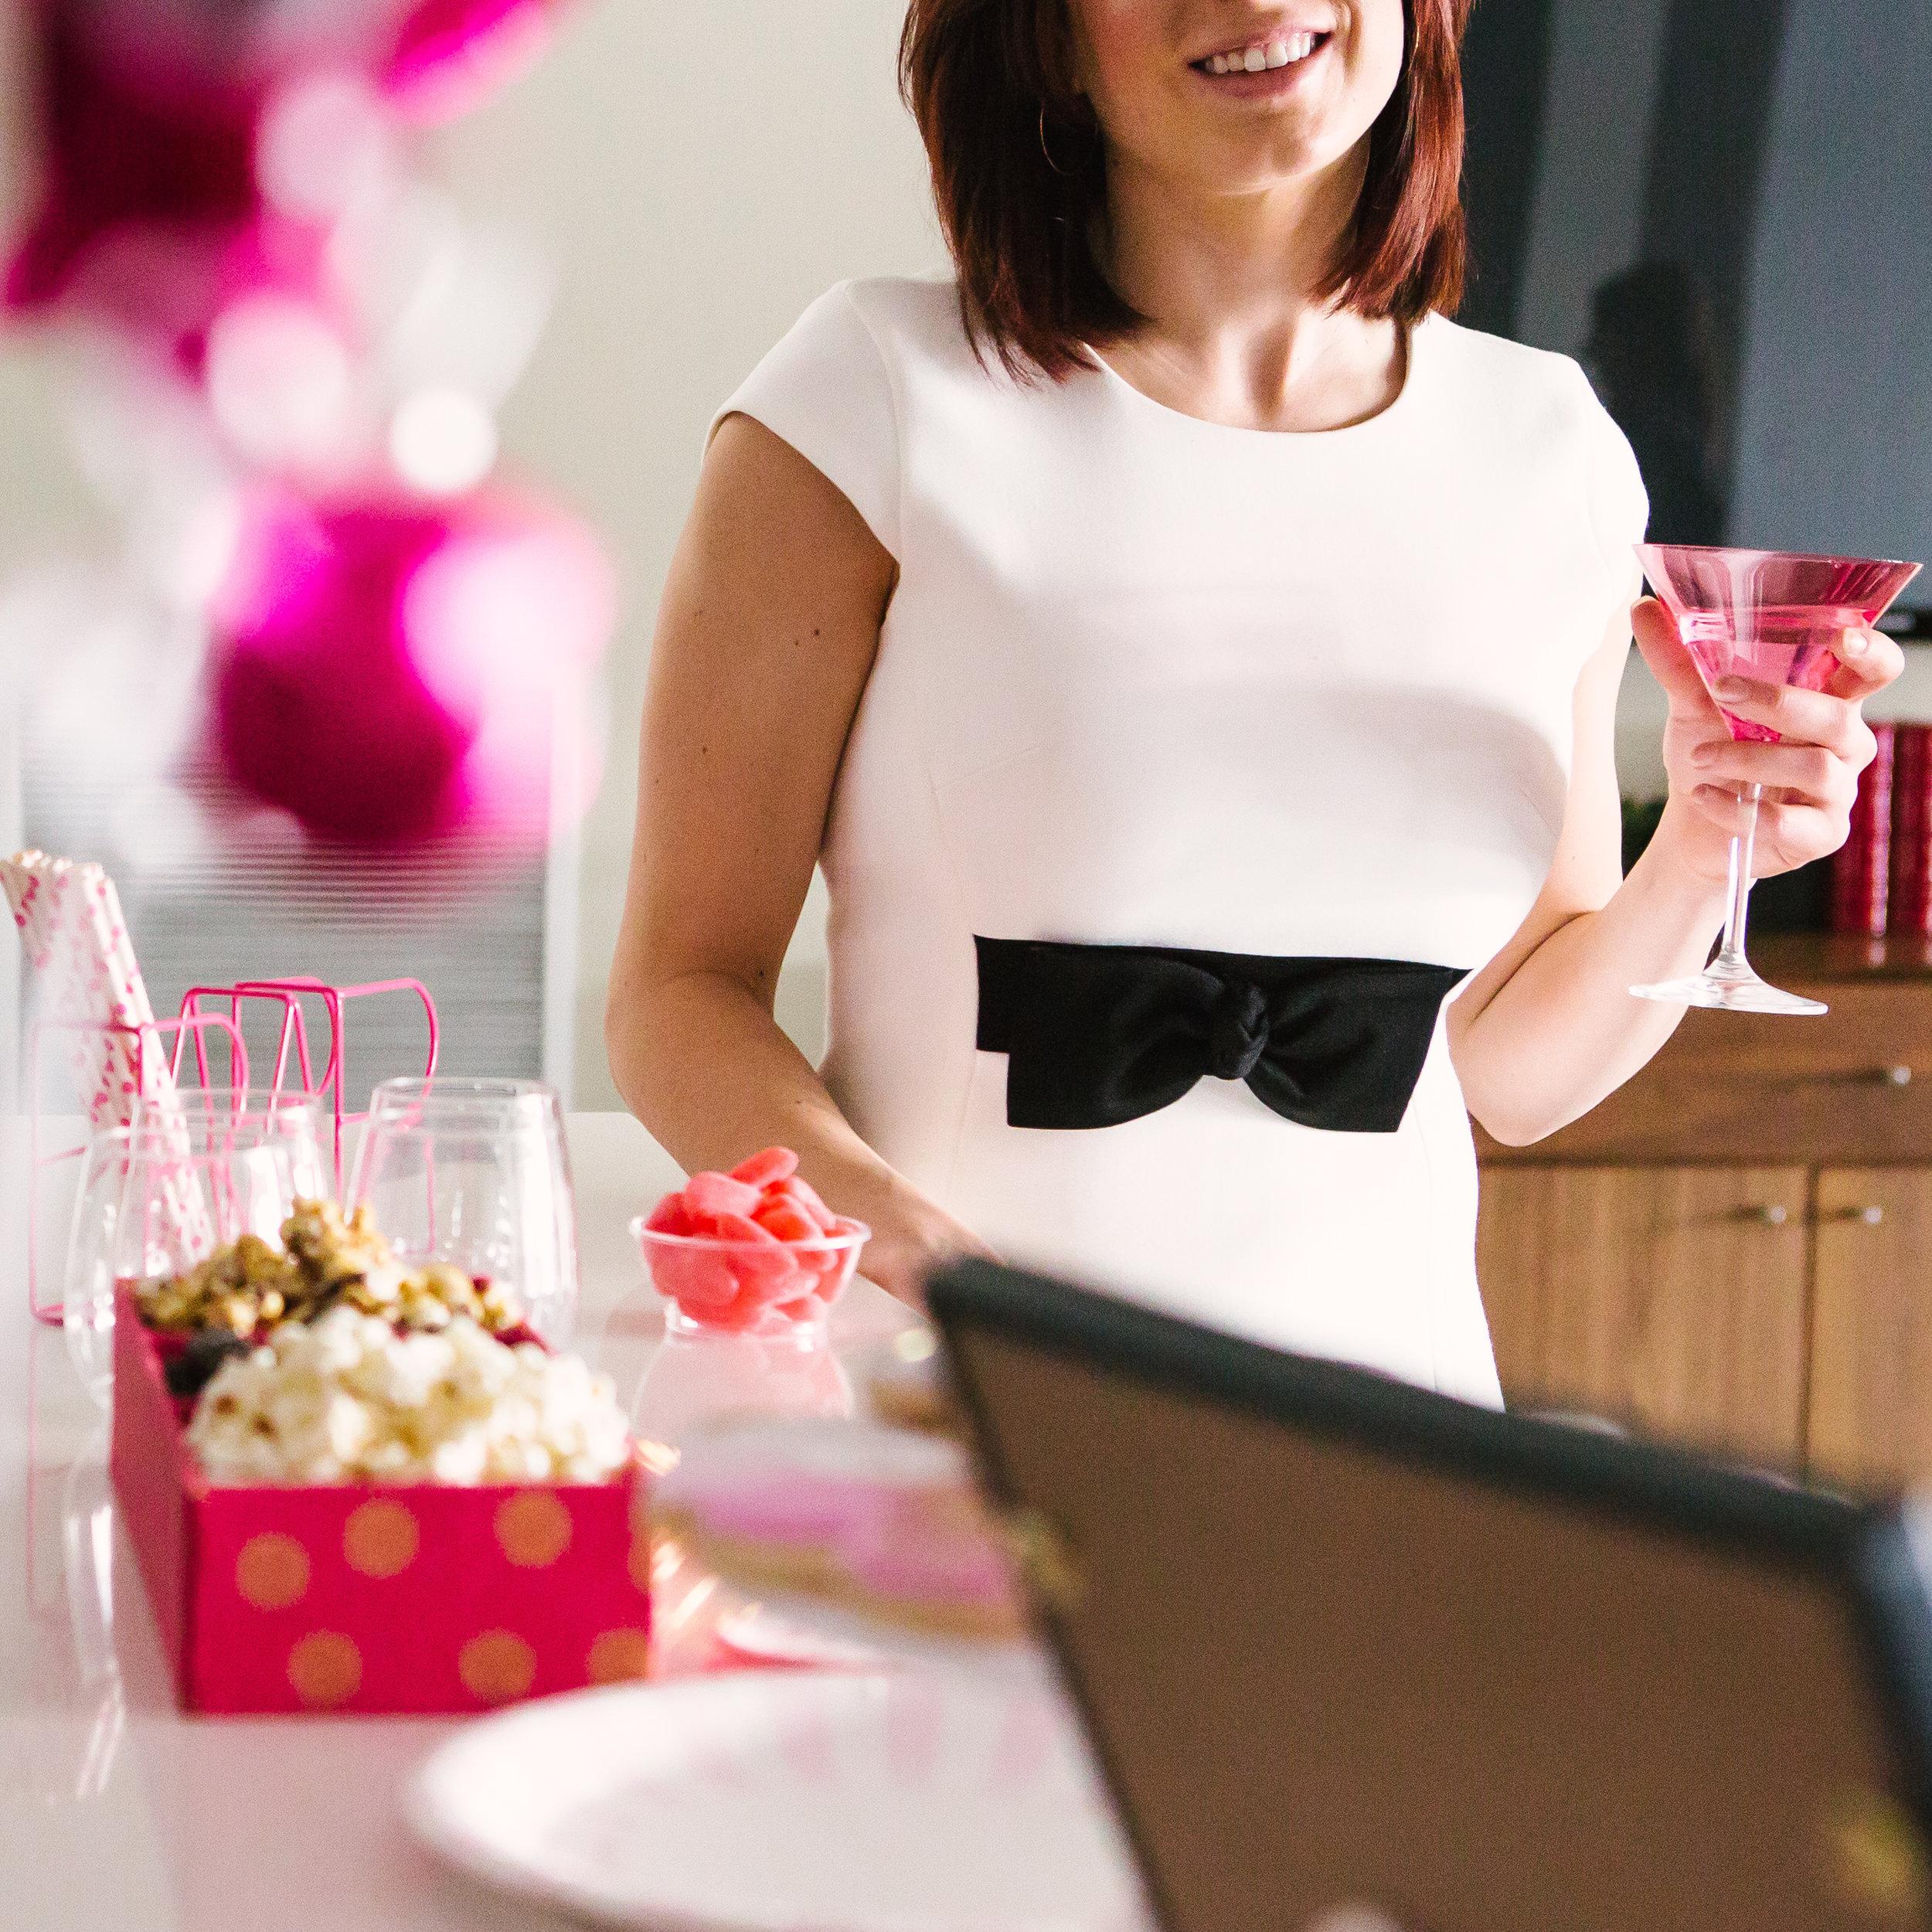 jess burke well layered minneapolis blogger valentines style galentines style fashion blogger valentines day style inspiration, valentines day outfit ideas.png